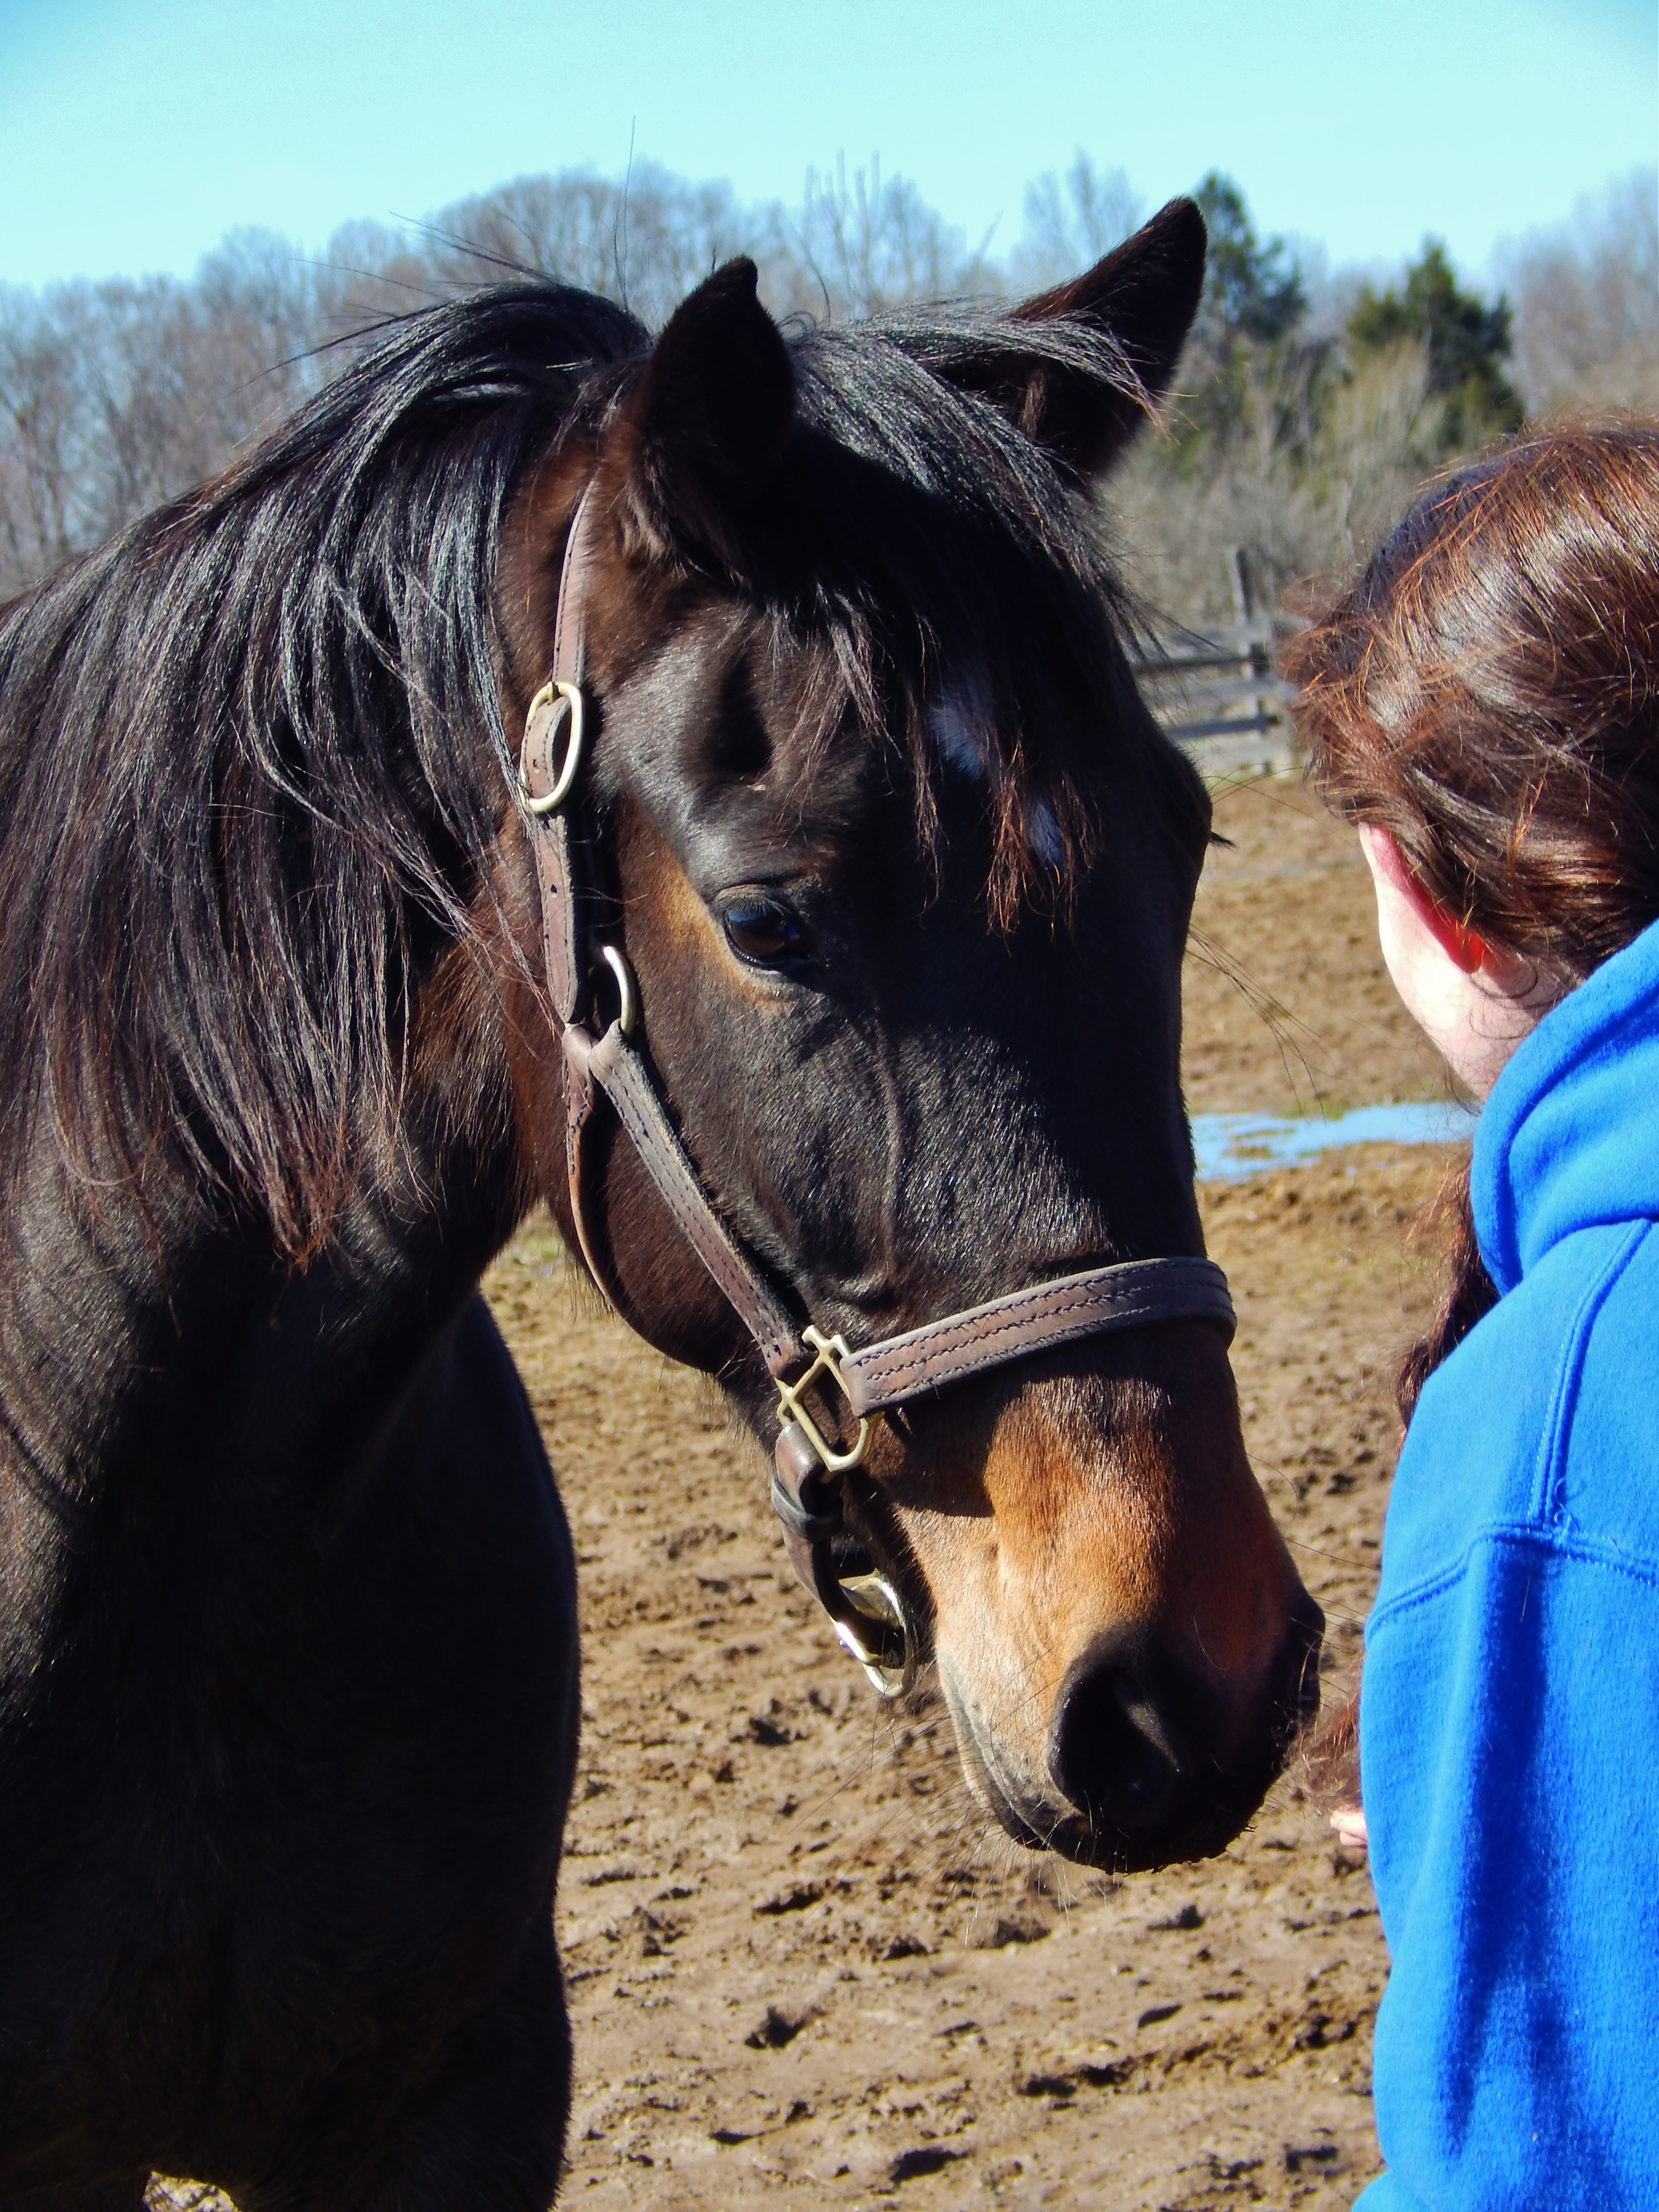 Pets For Adoption At Sunshine Horses Inc In Clay Ny